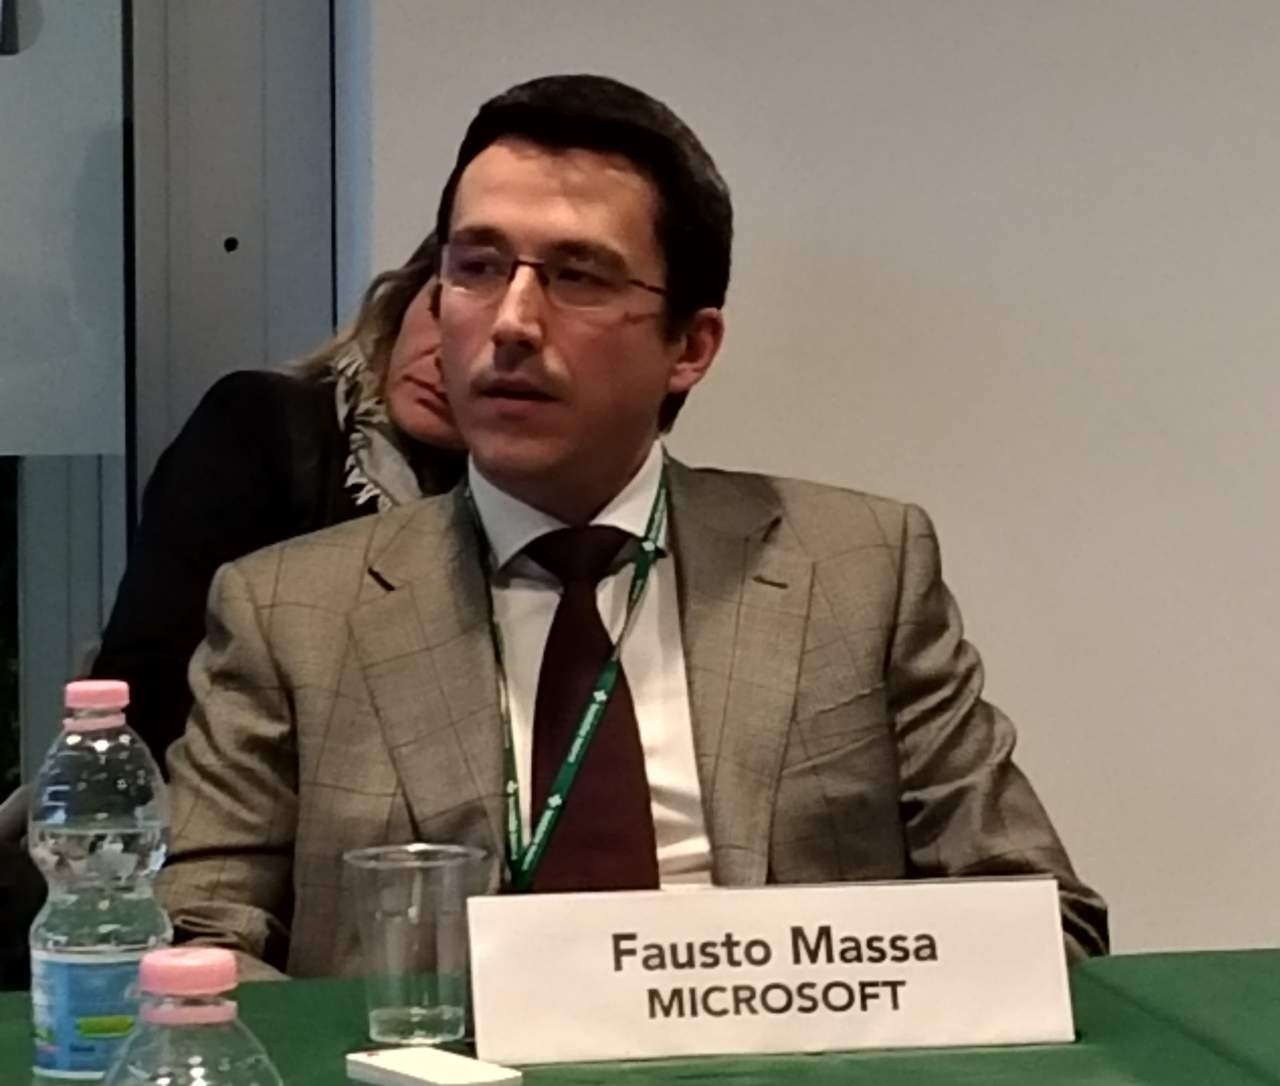 Fausto Massa Microsoft